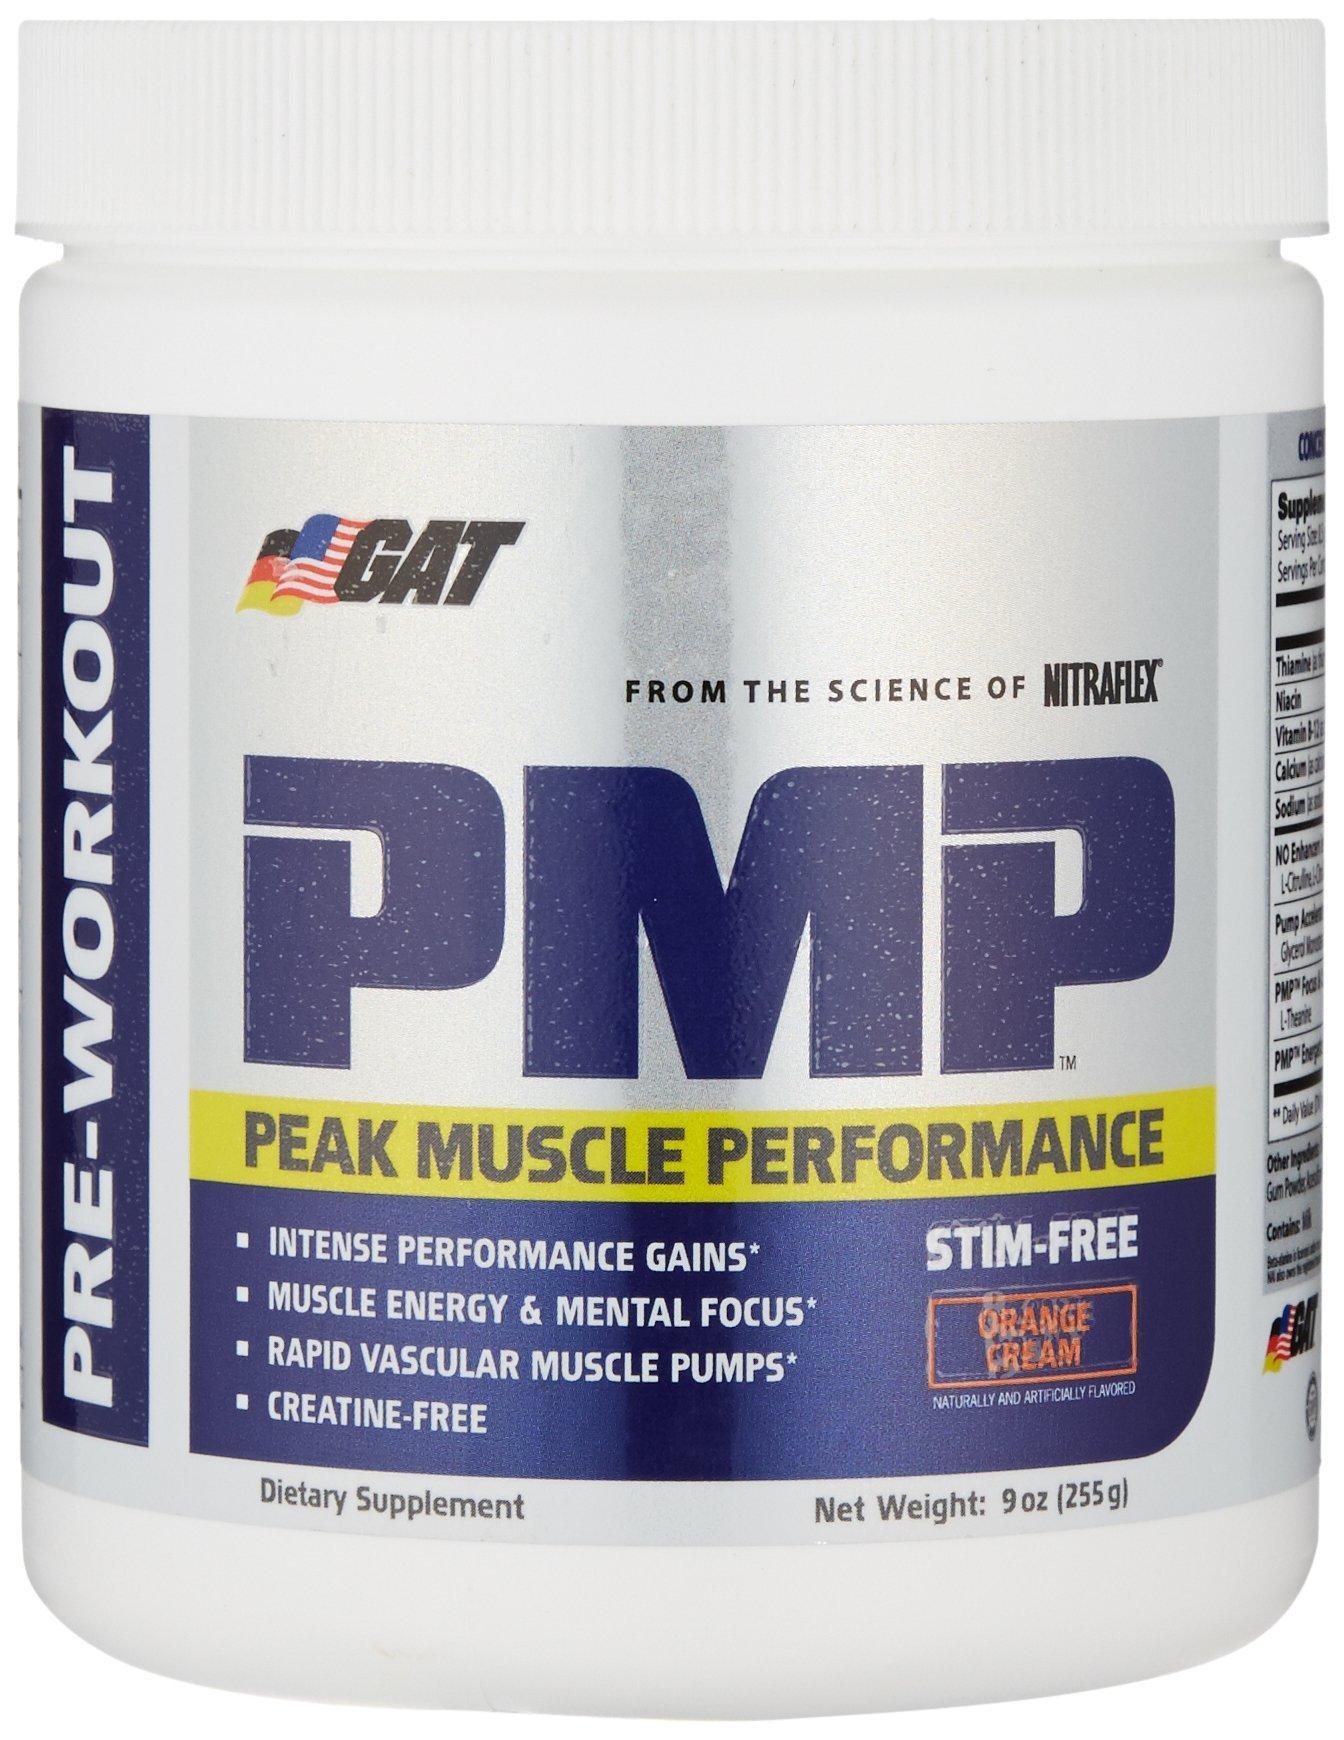 Gat Clinically Tested Nitraflex Testosterone Enhancing Johnsonamp039s Milk Powder 300gr Pmp Peak Muscle Performance Next Generation Pre Workout For Intense